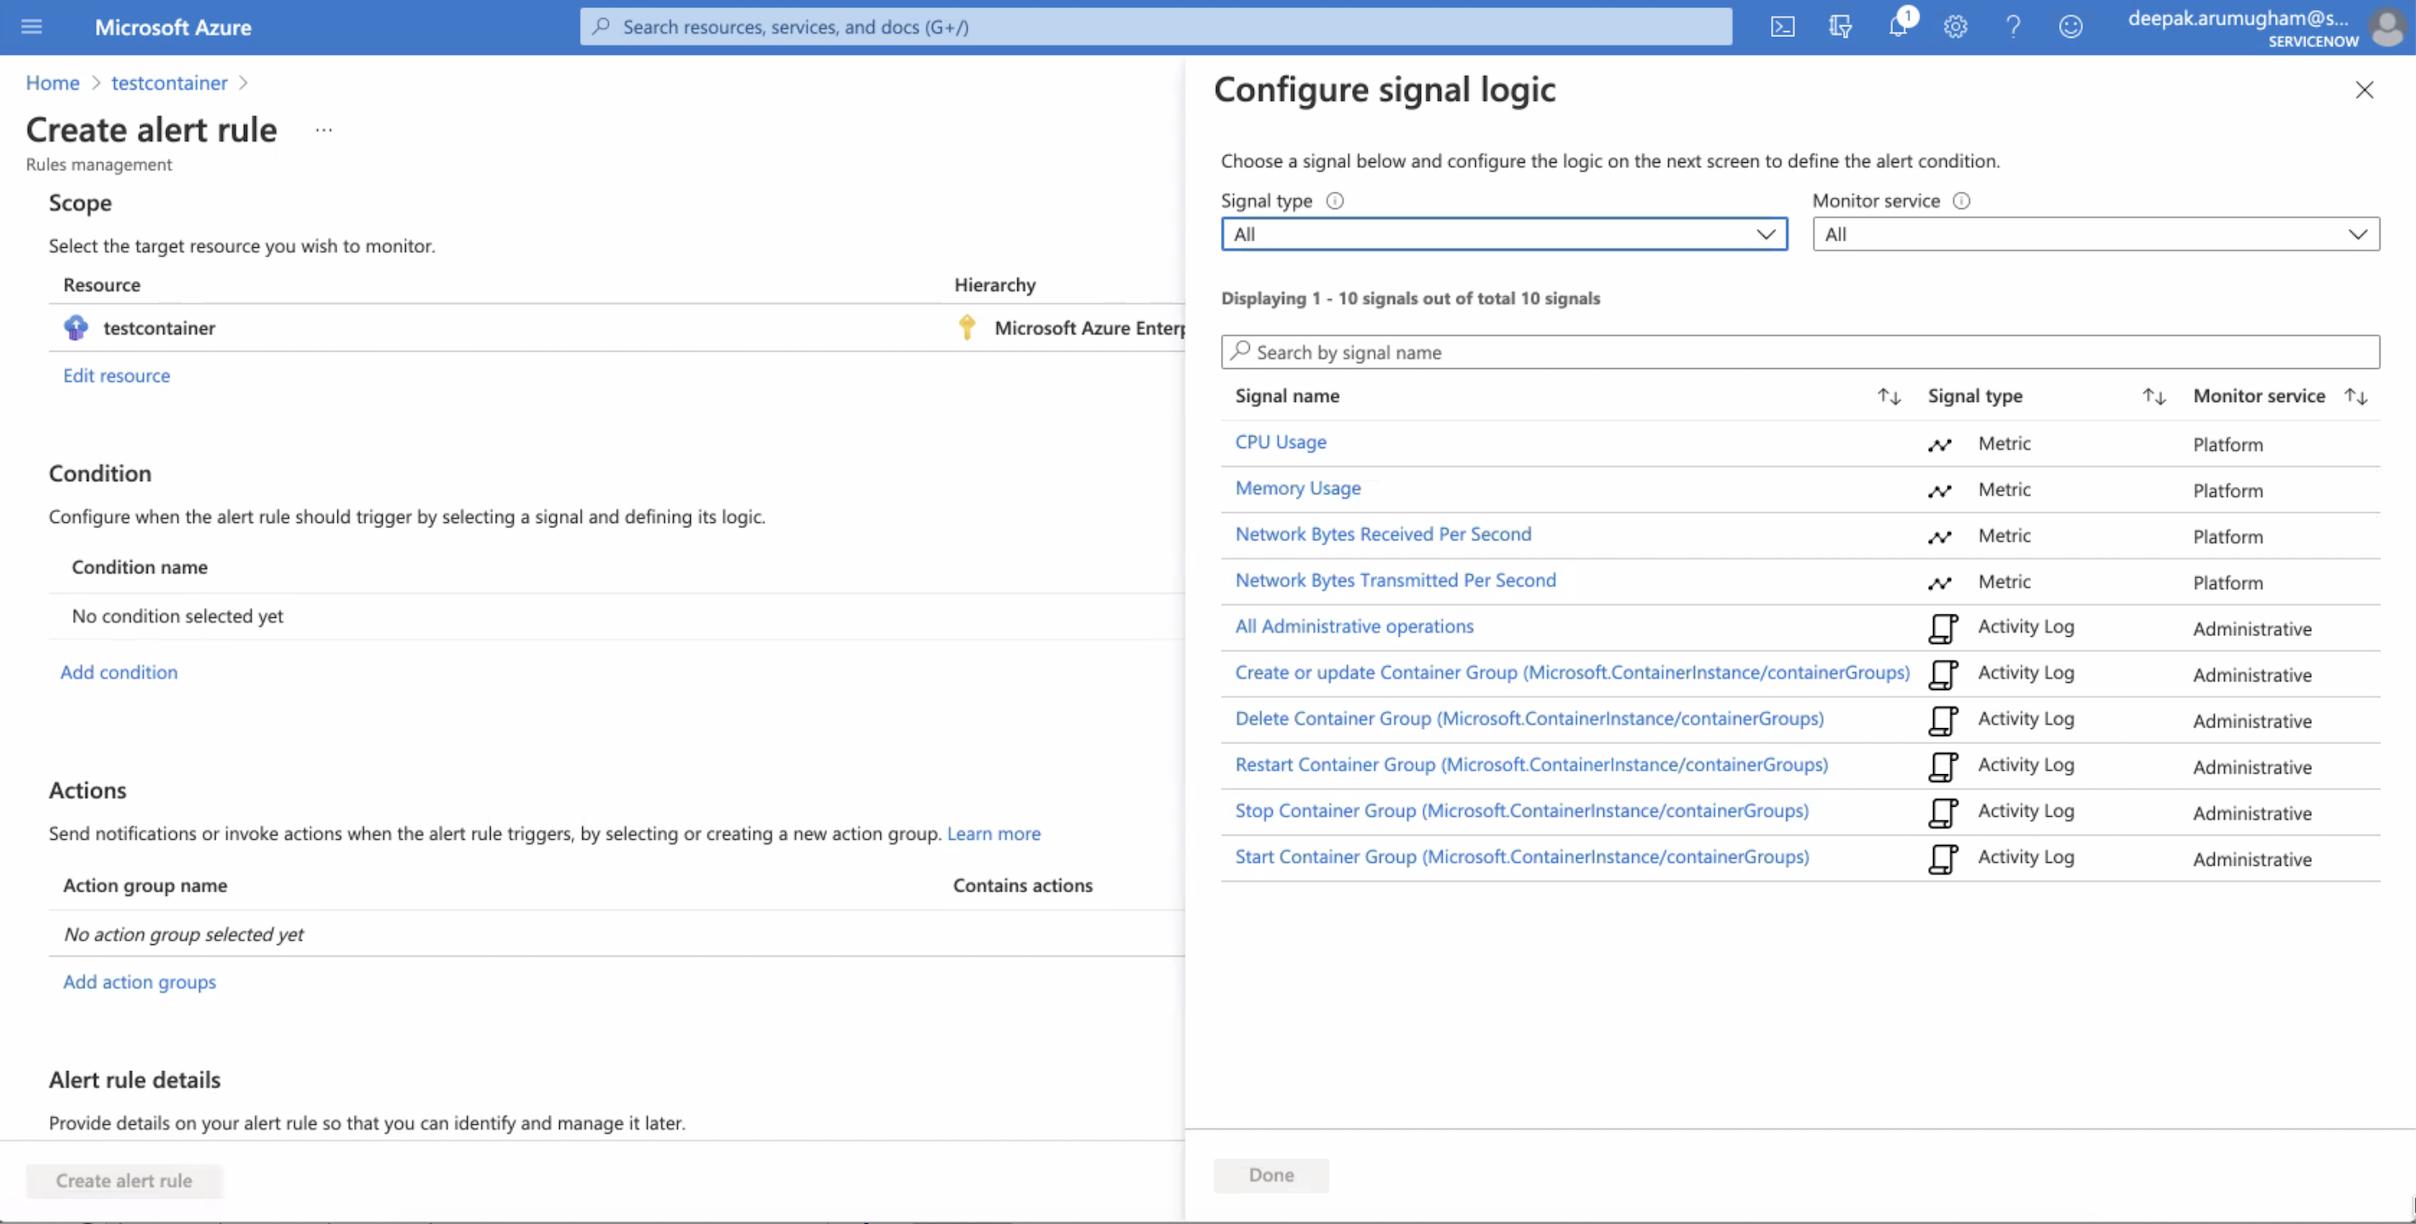 The Configure signal logic page.